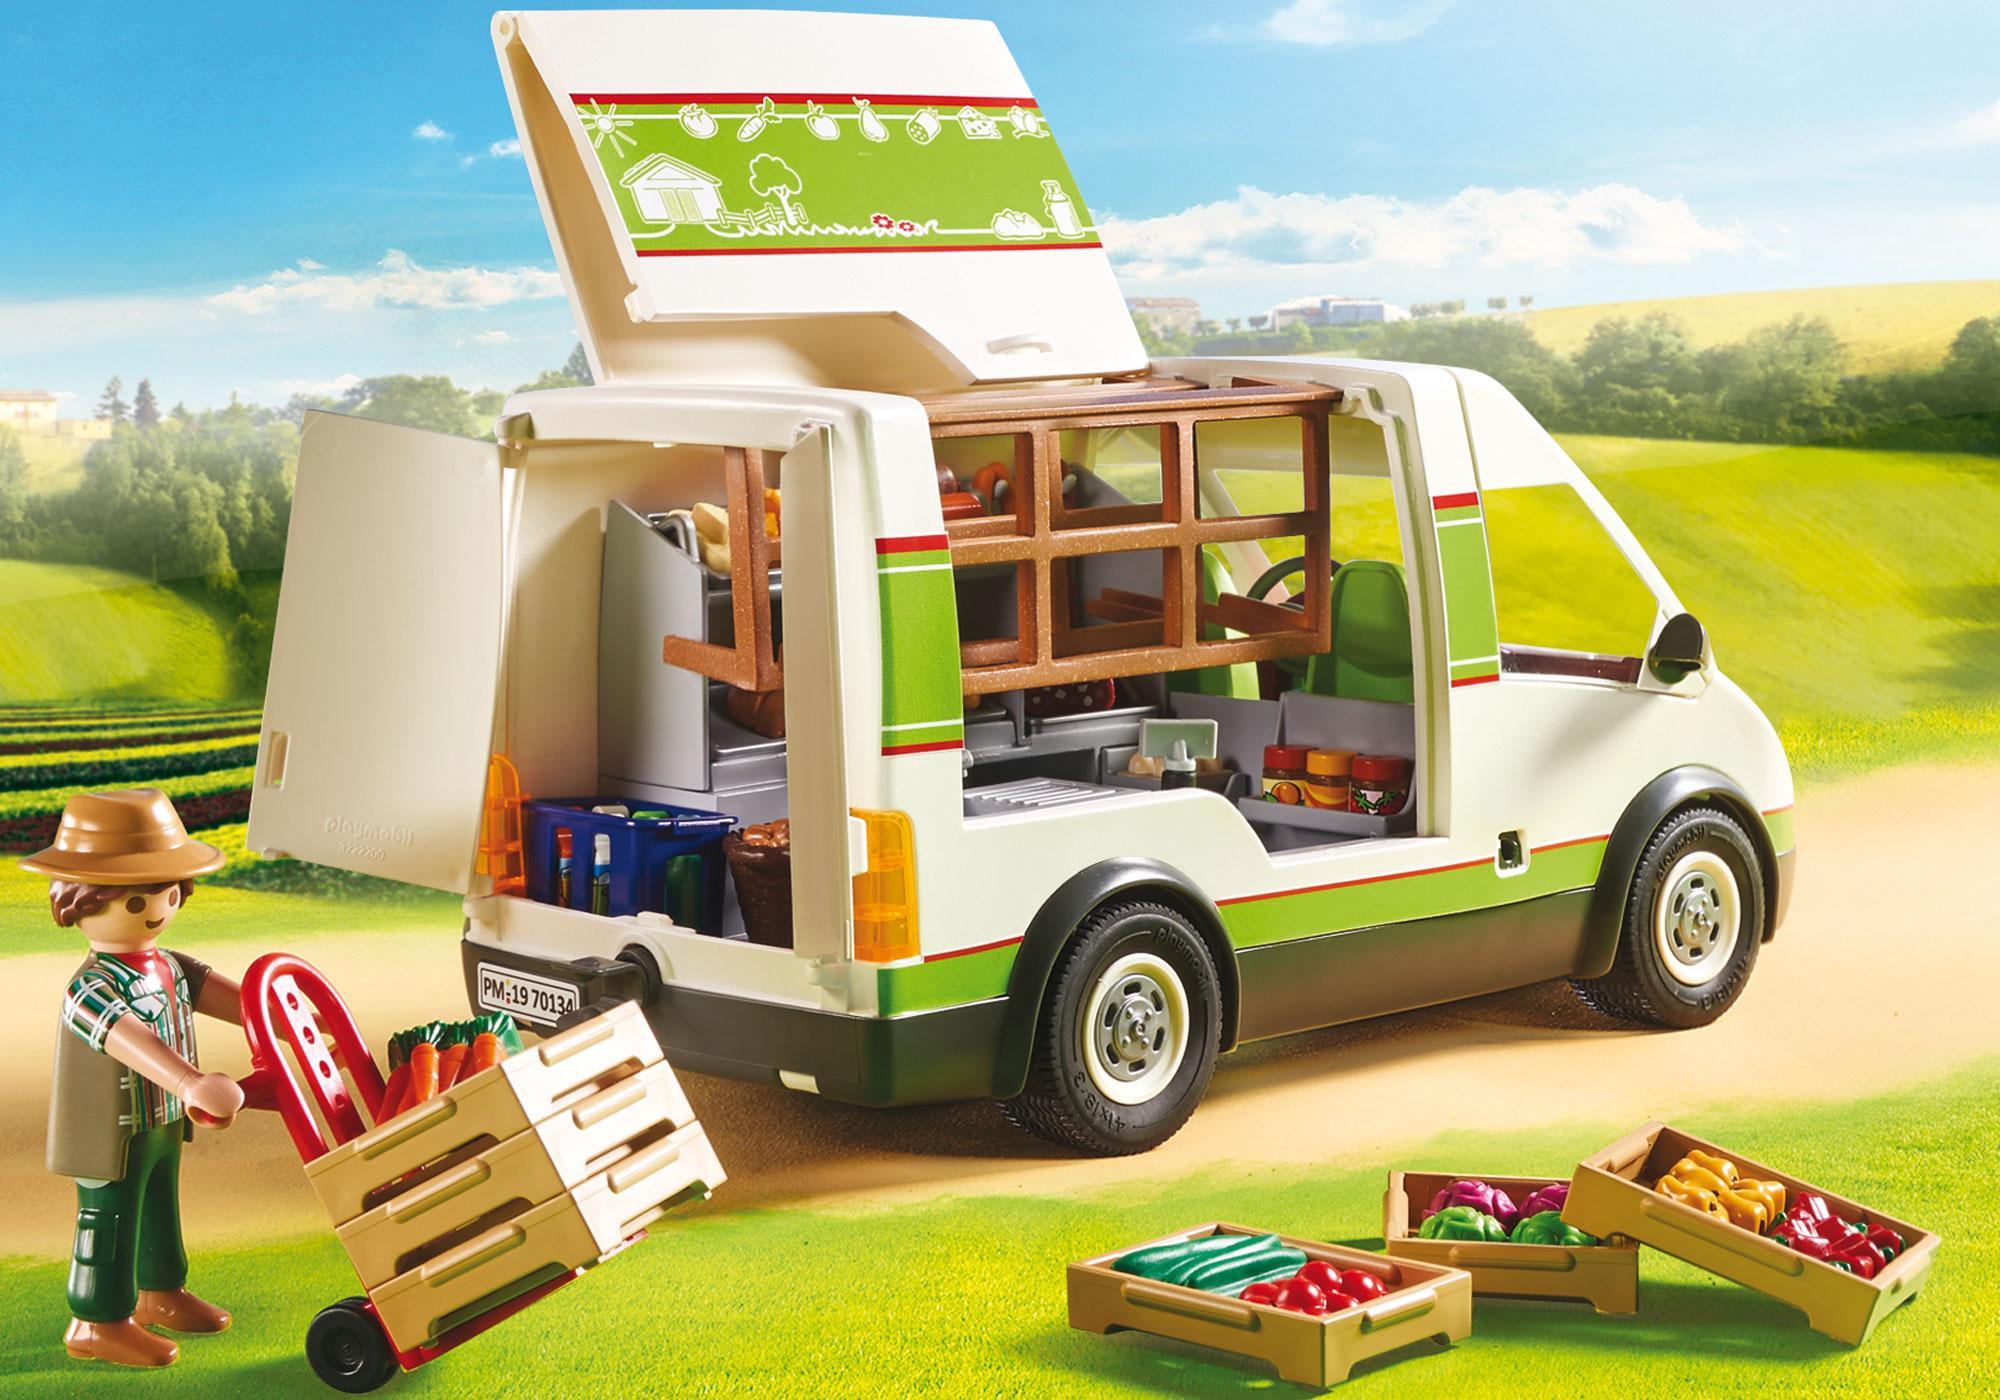 http://media.playmobil.com/i/playmobil/70134_product_extra1/Hofladen-Fahrzeug